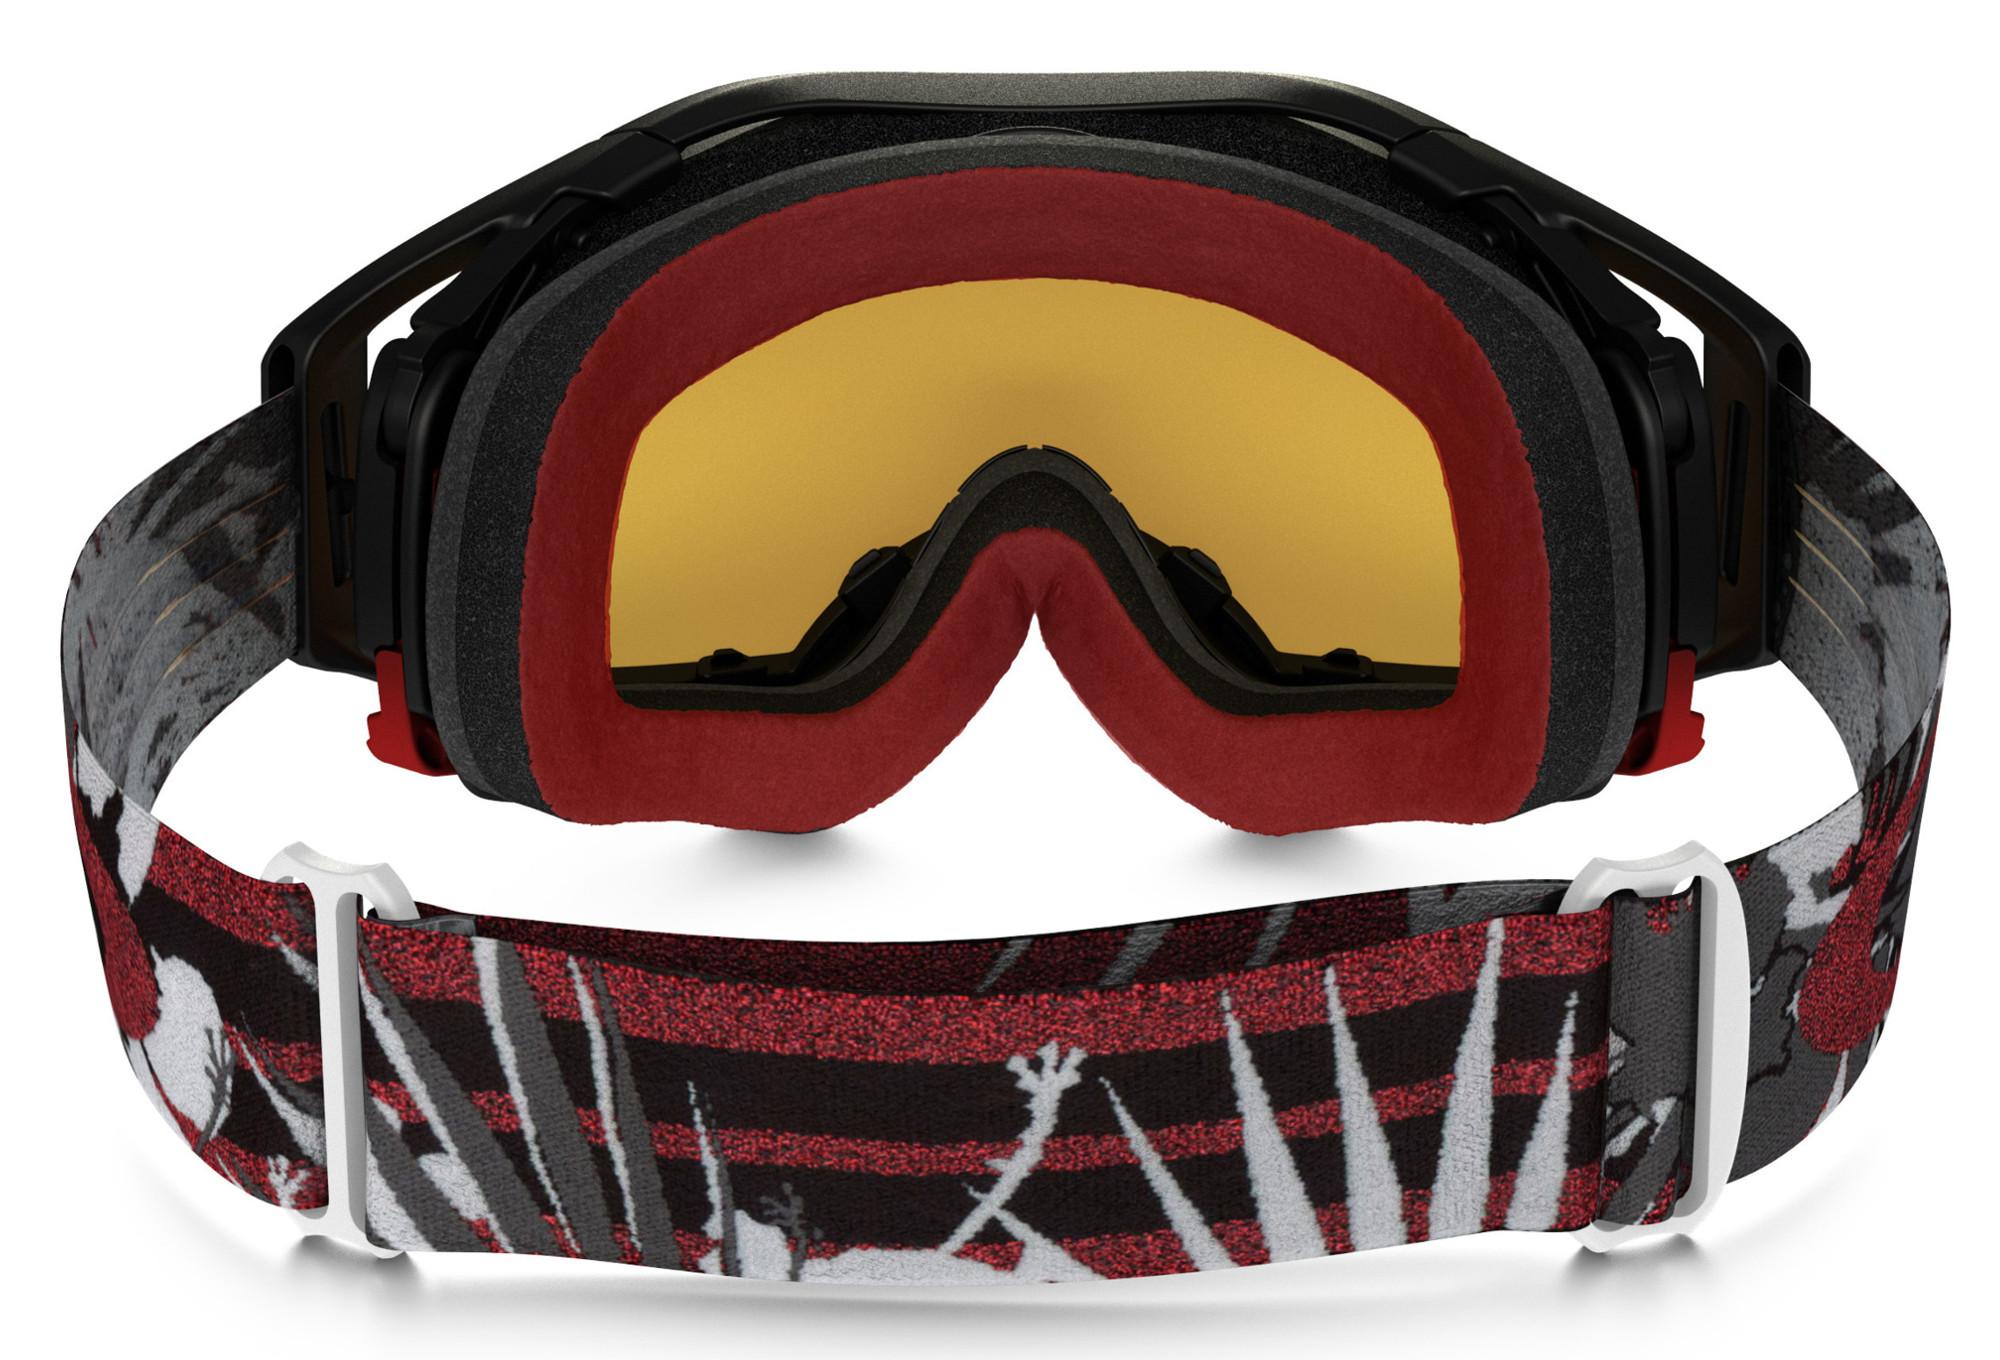 Oakley Airbrake Mx Kroc94 Goggle Grey Red Fire Iridium